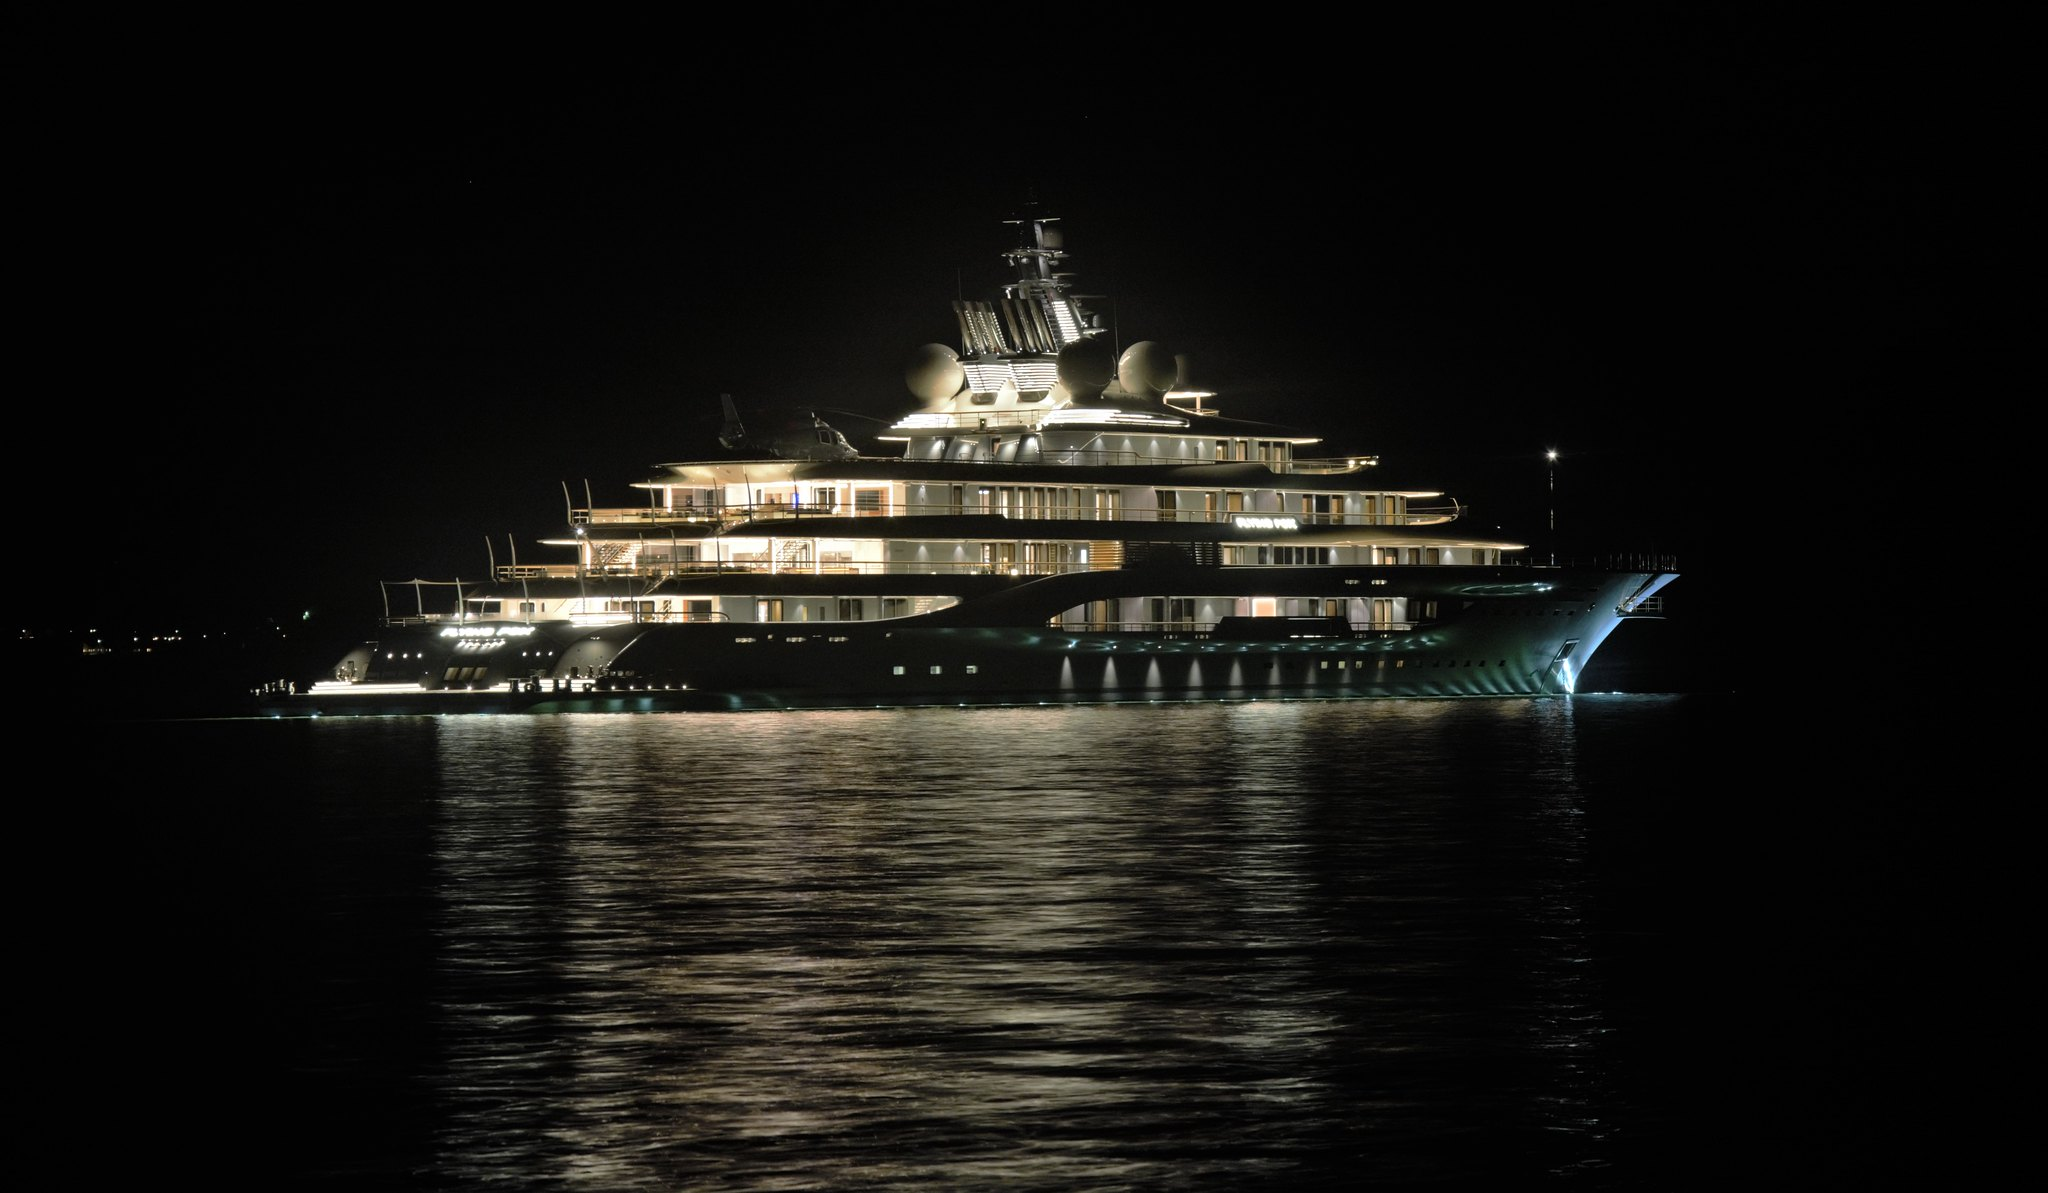 136m Mega Yacht at night